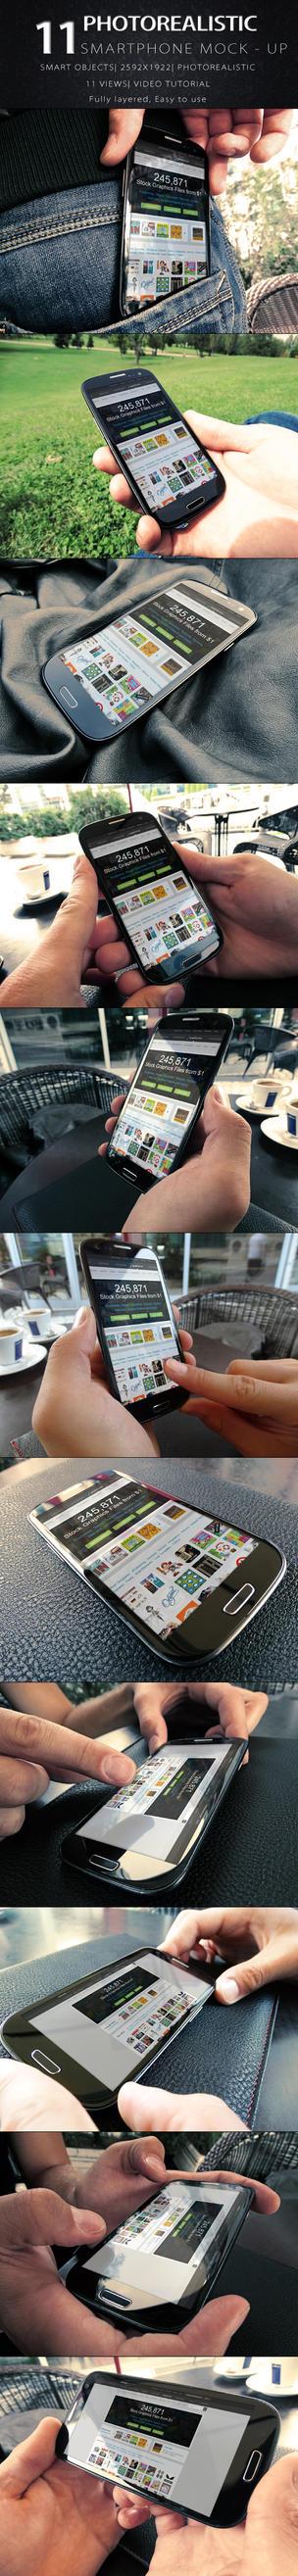 Photorealistic Smart Phone Mock Up by KILVAM